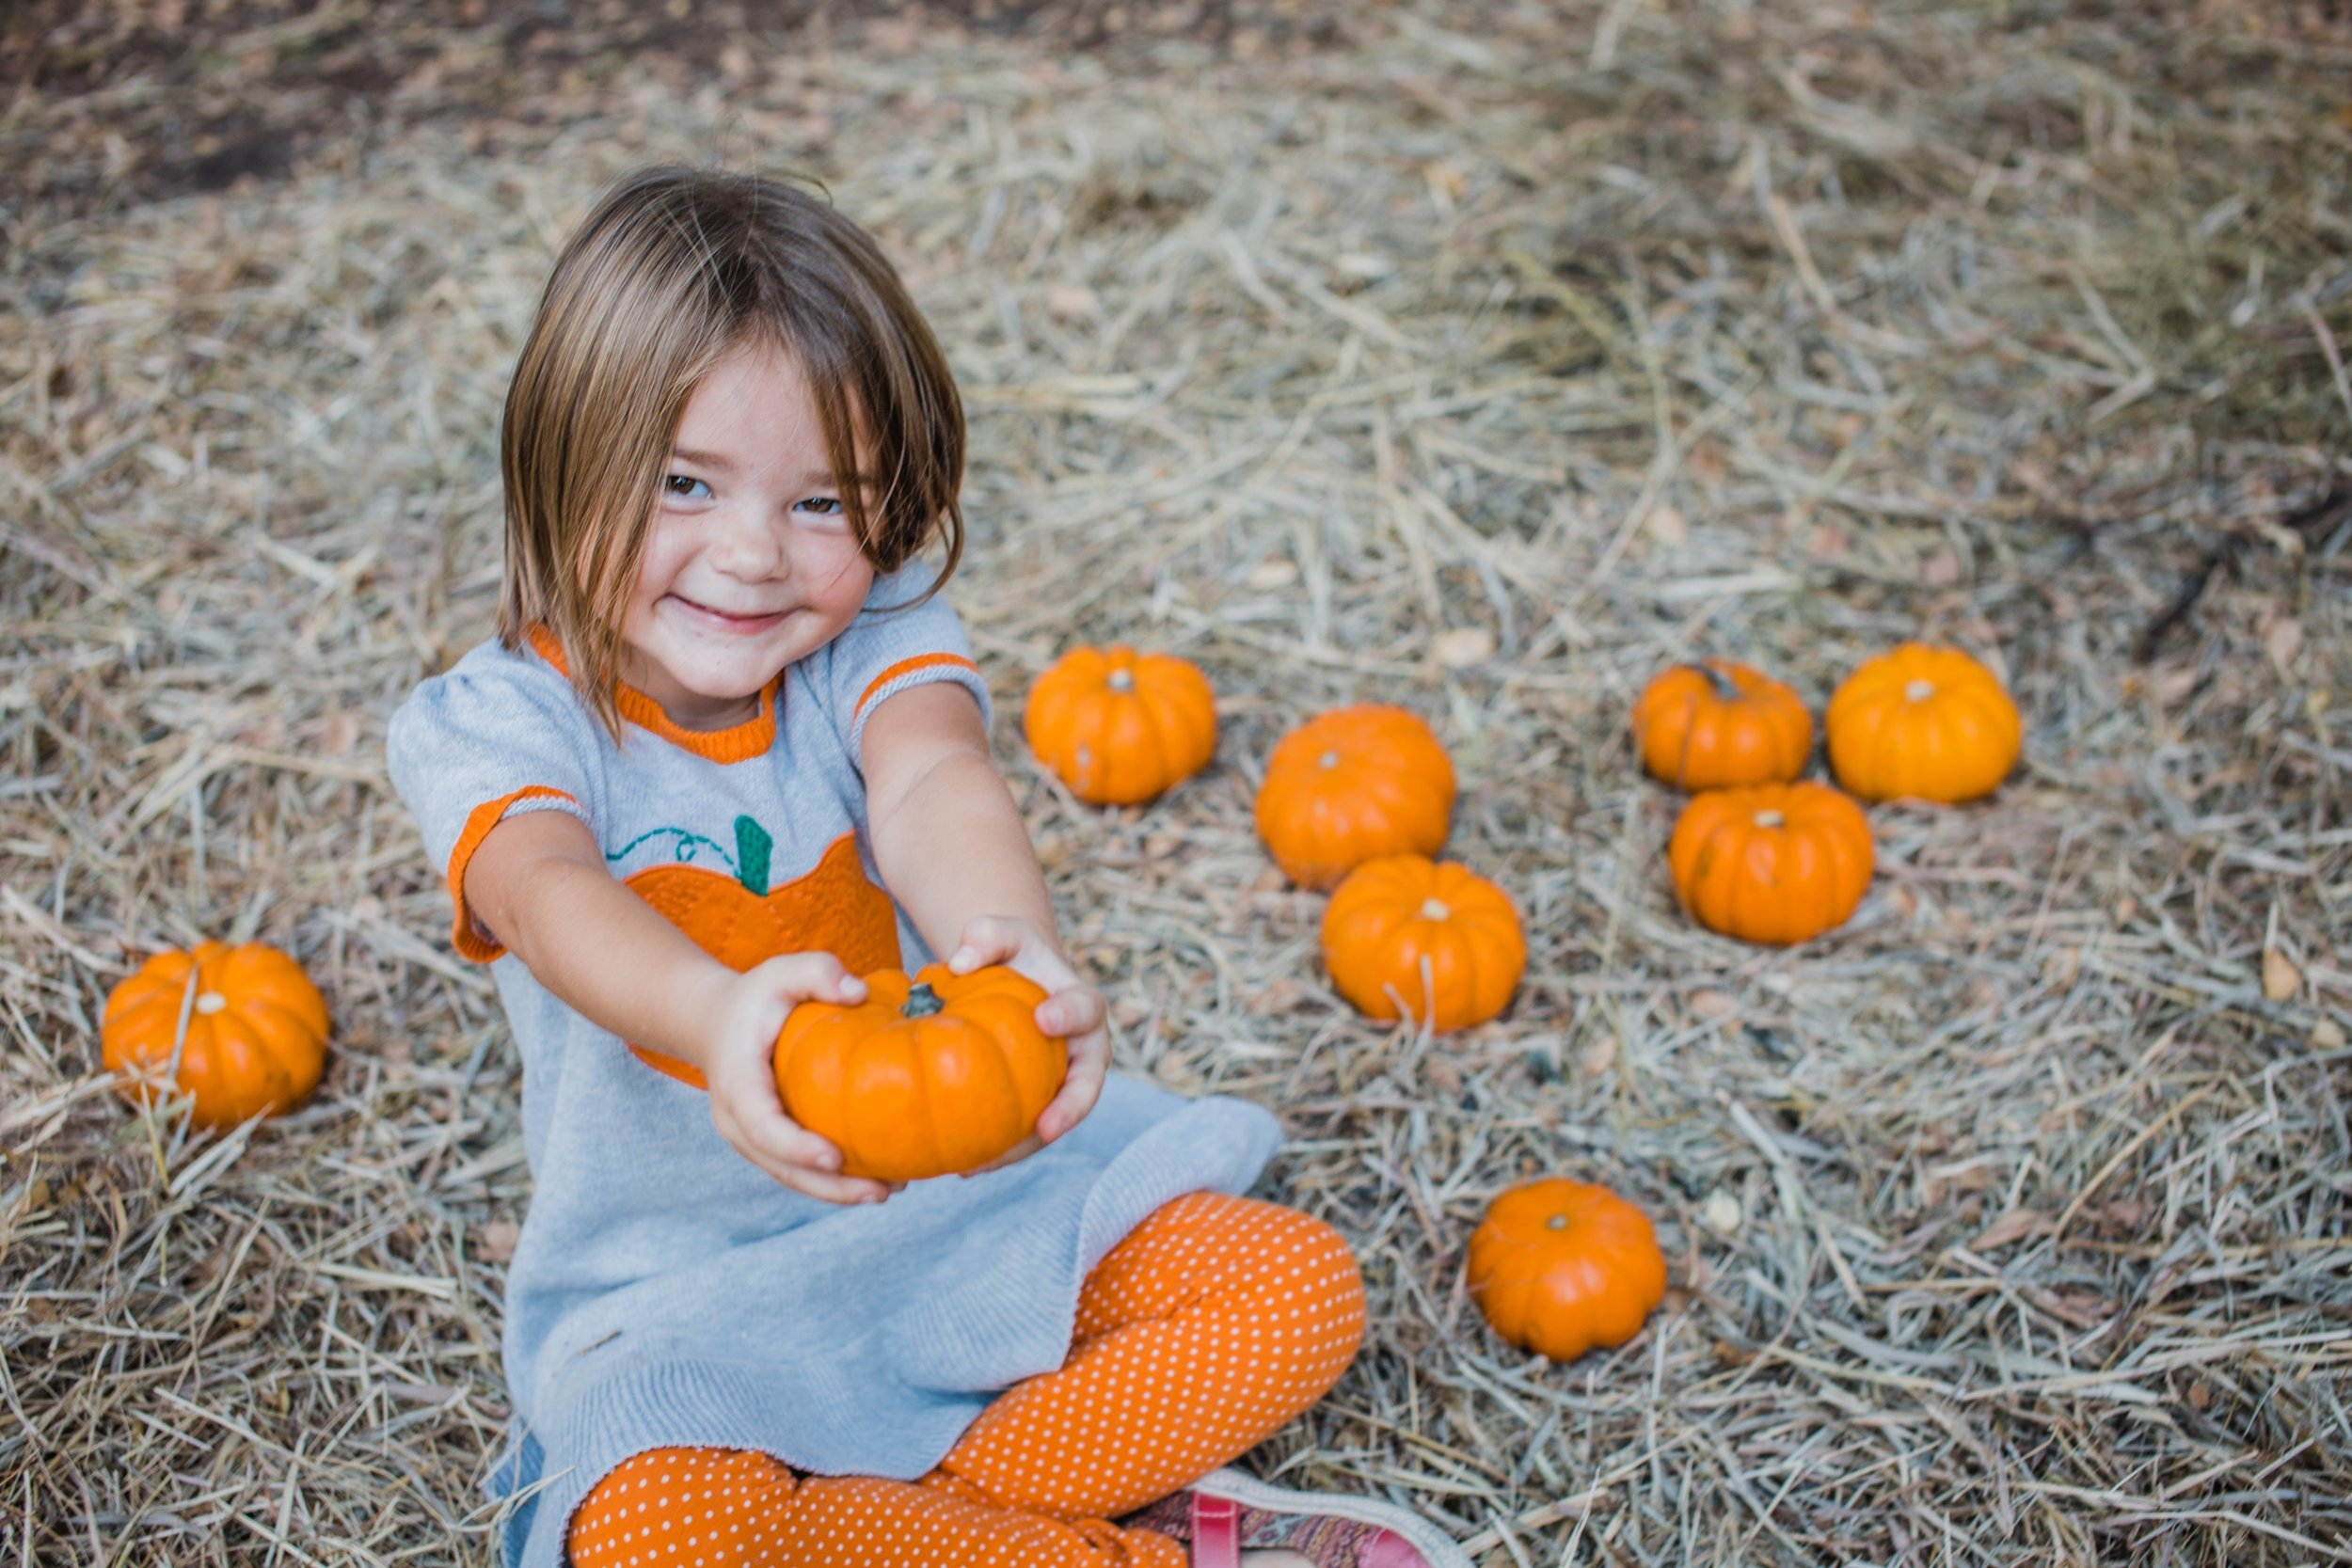 scpf-pumpkins-sweetie.jpg